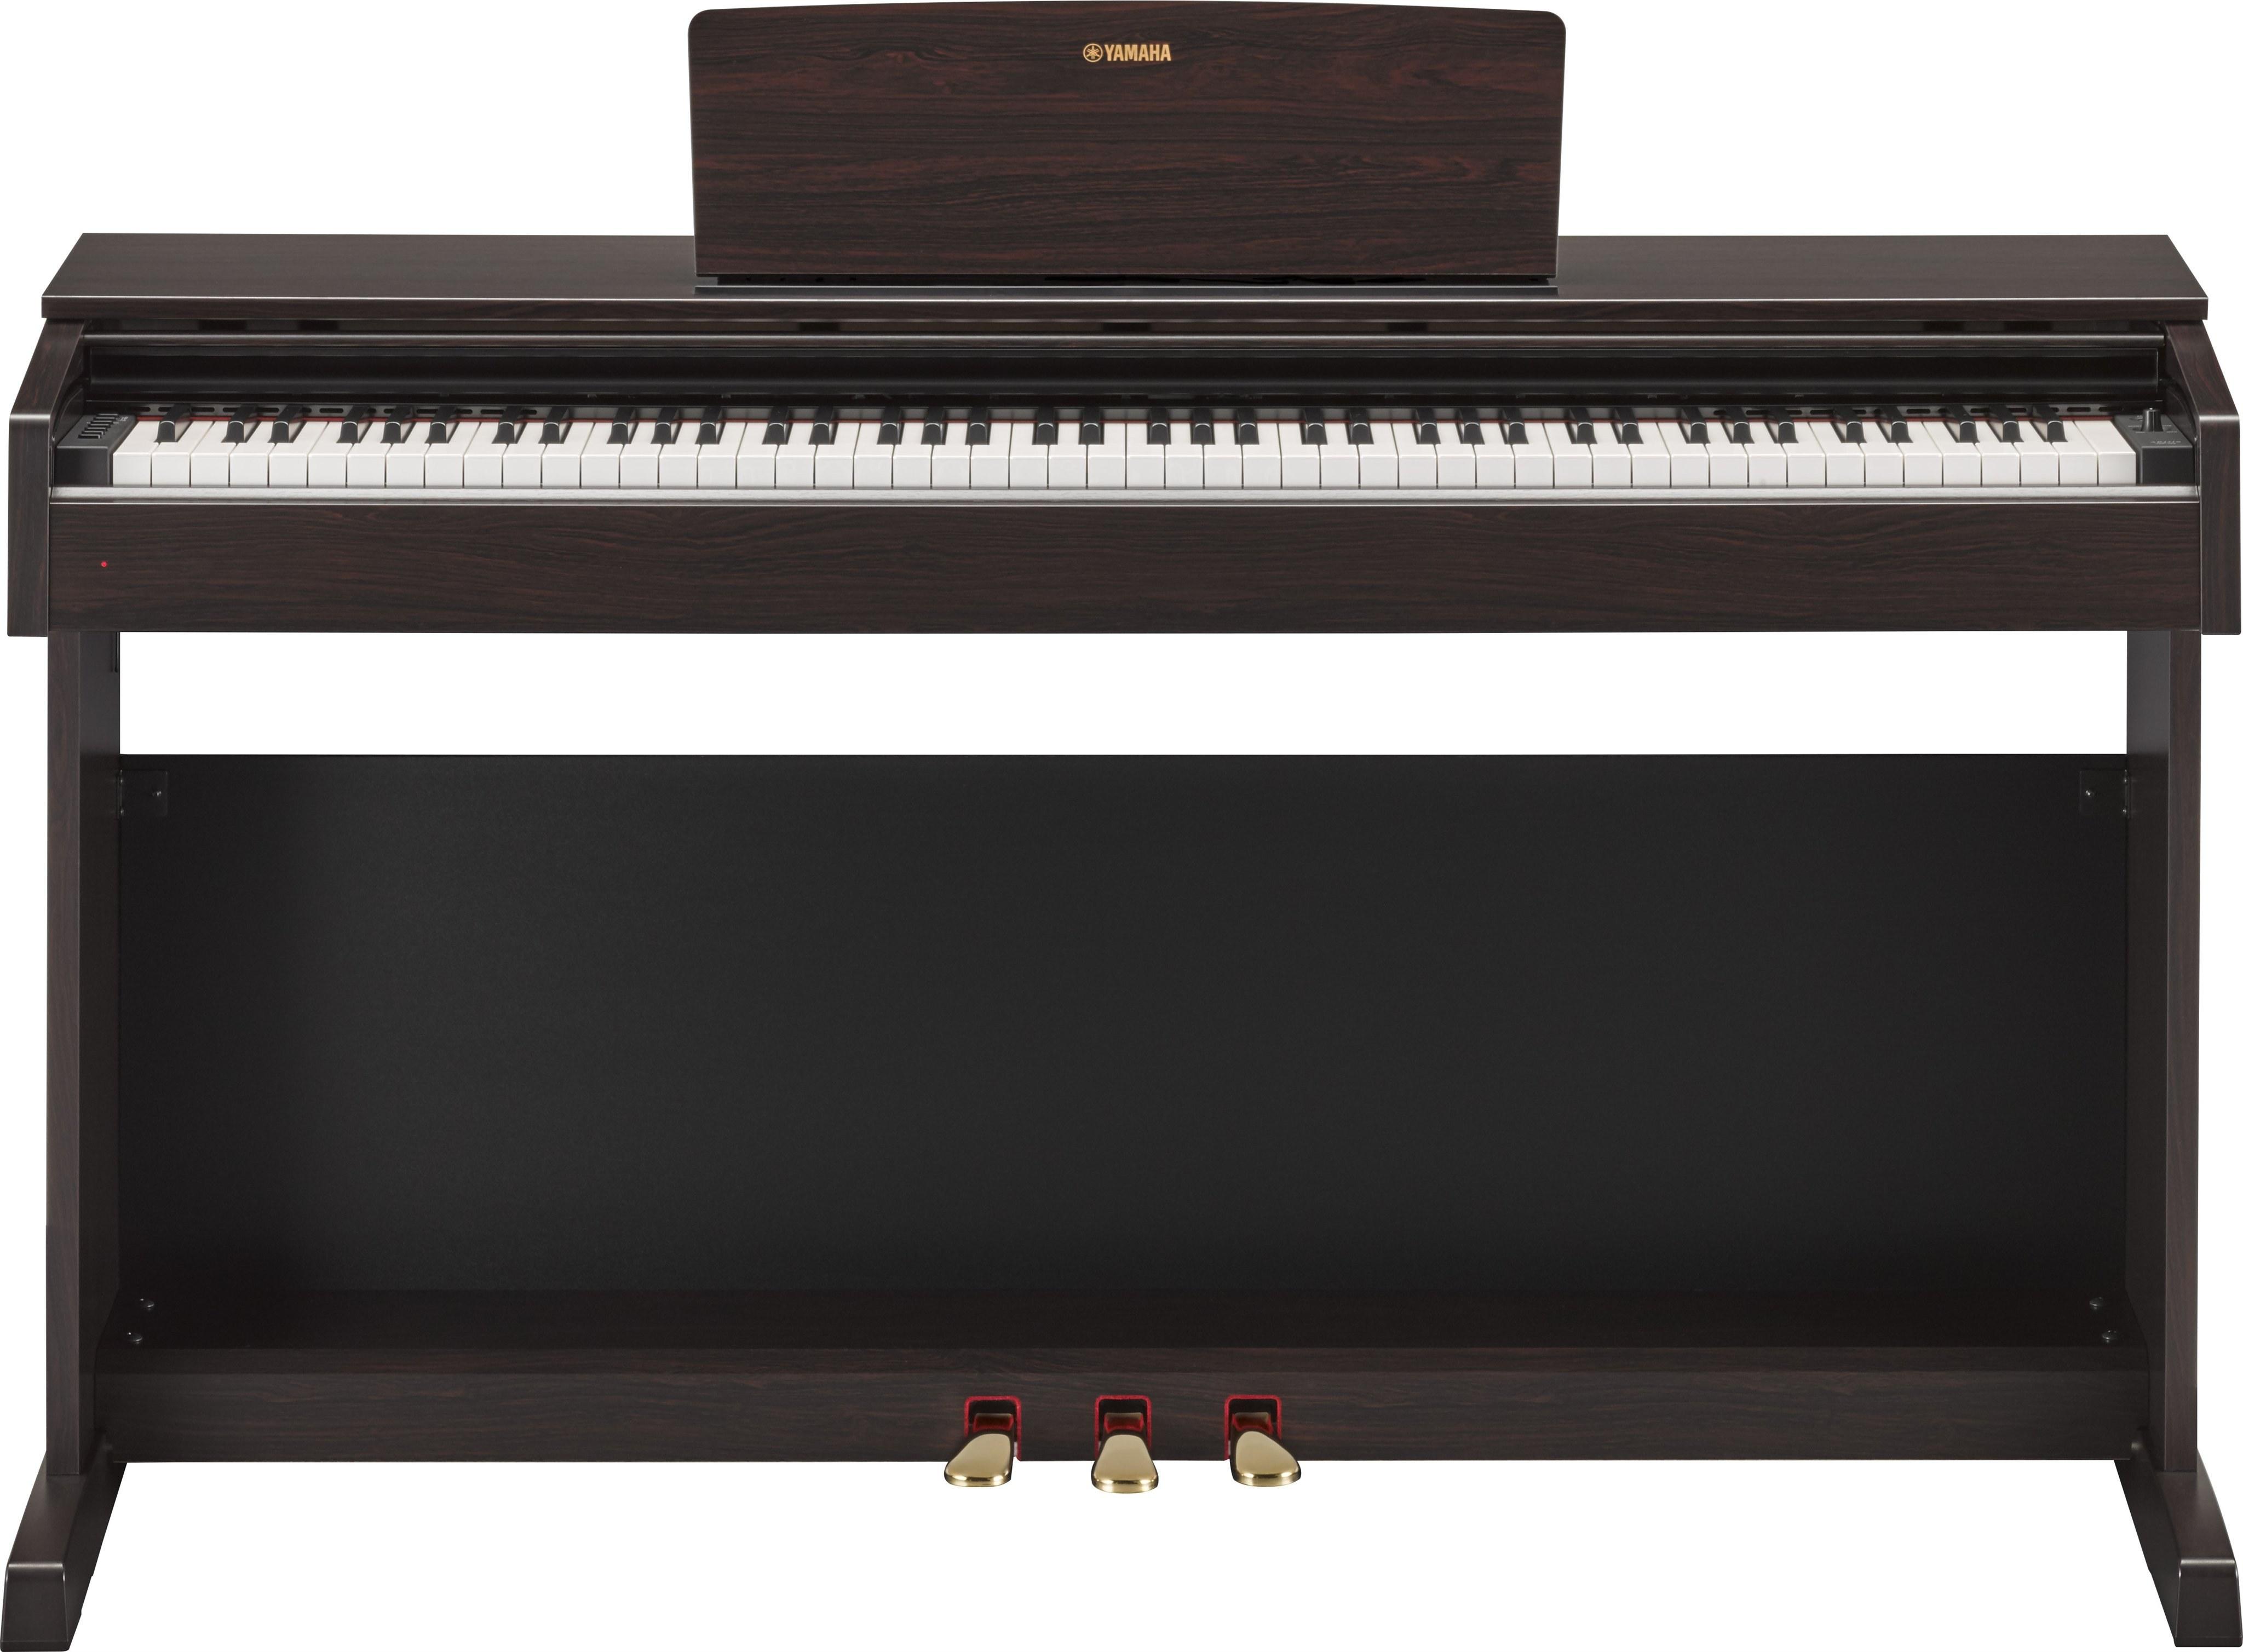 عکس پیانو دیجیتال YAMAHA مدل YDP 143  پیانو-دیجیتال-yamaha-مدل-ydp-143